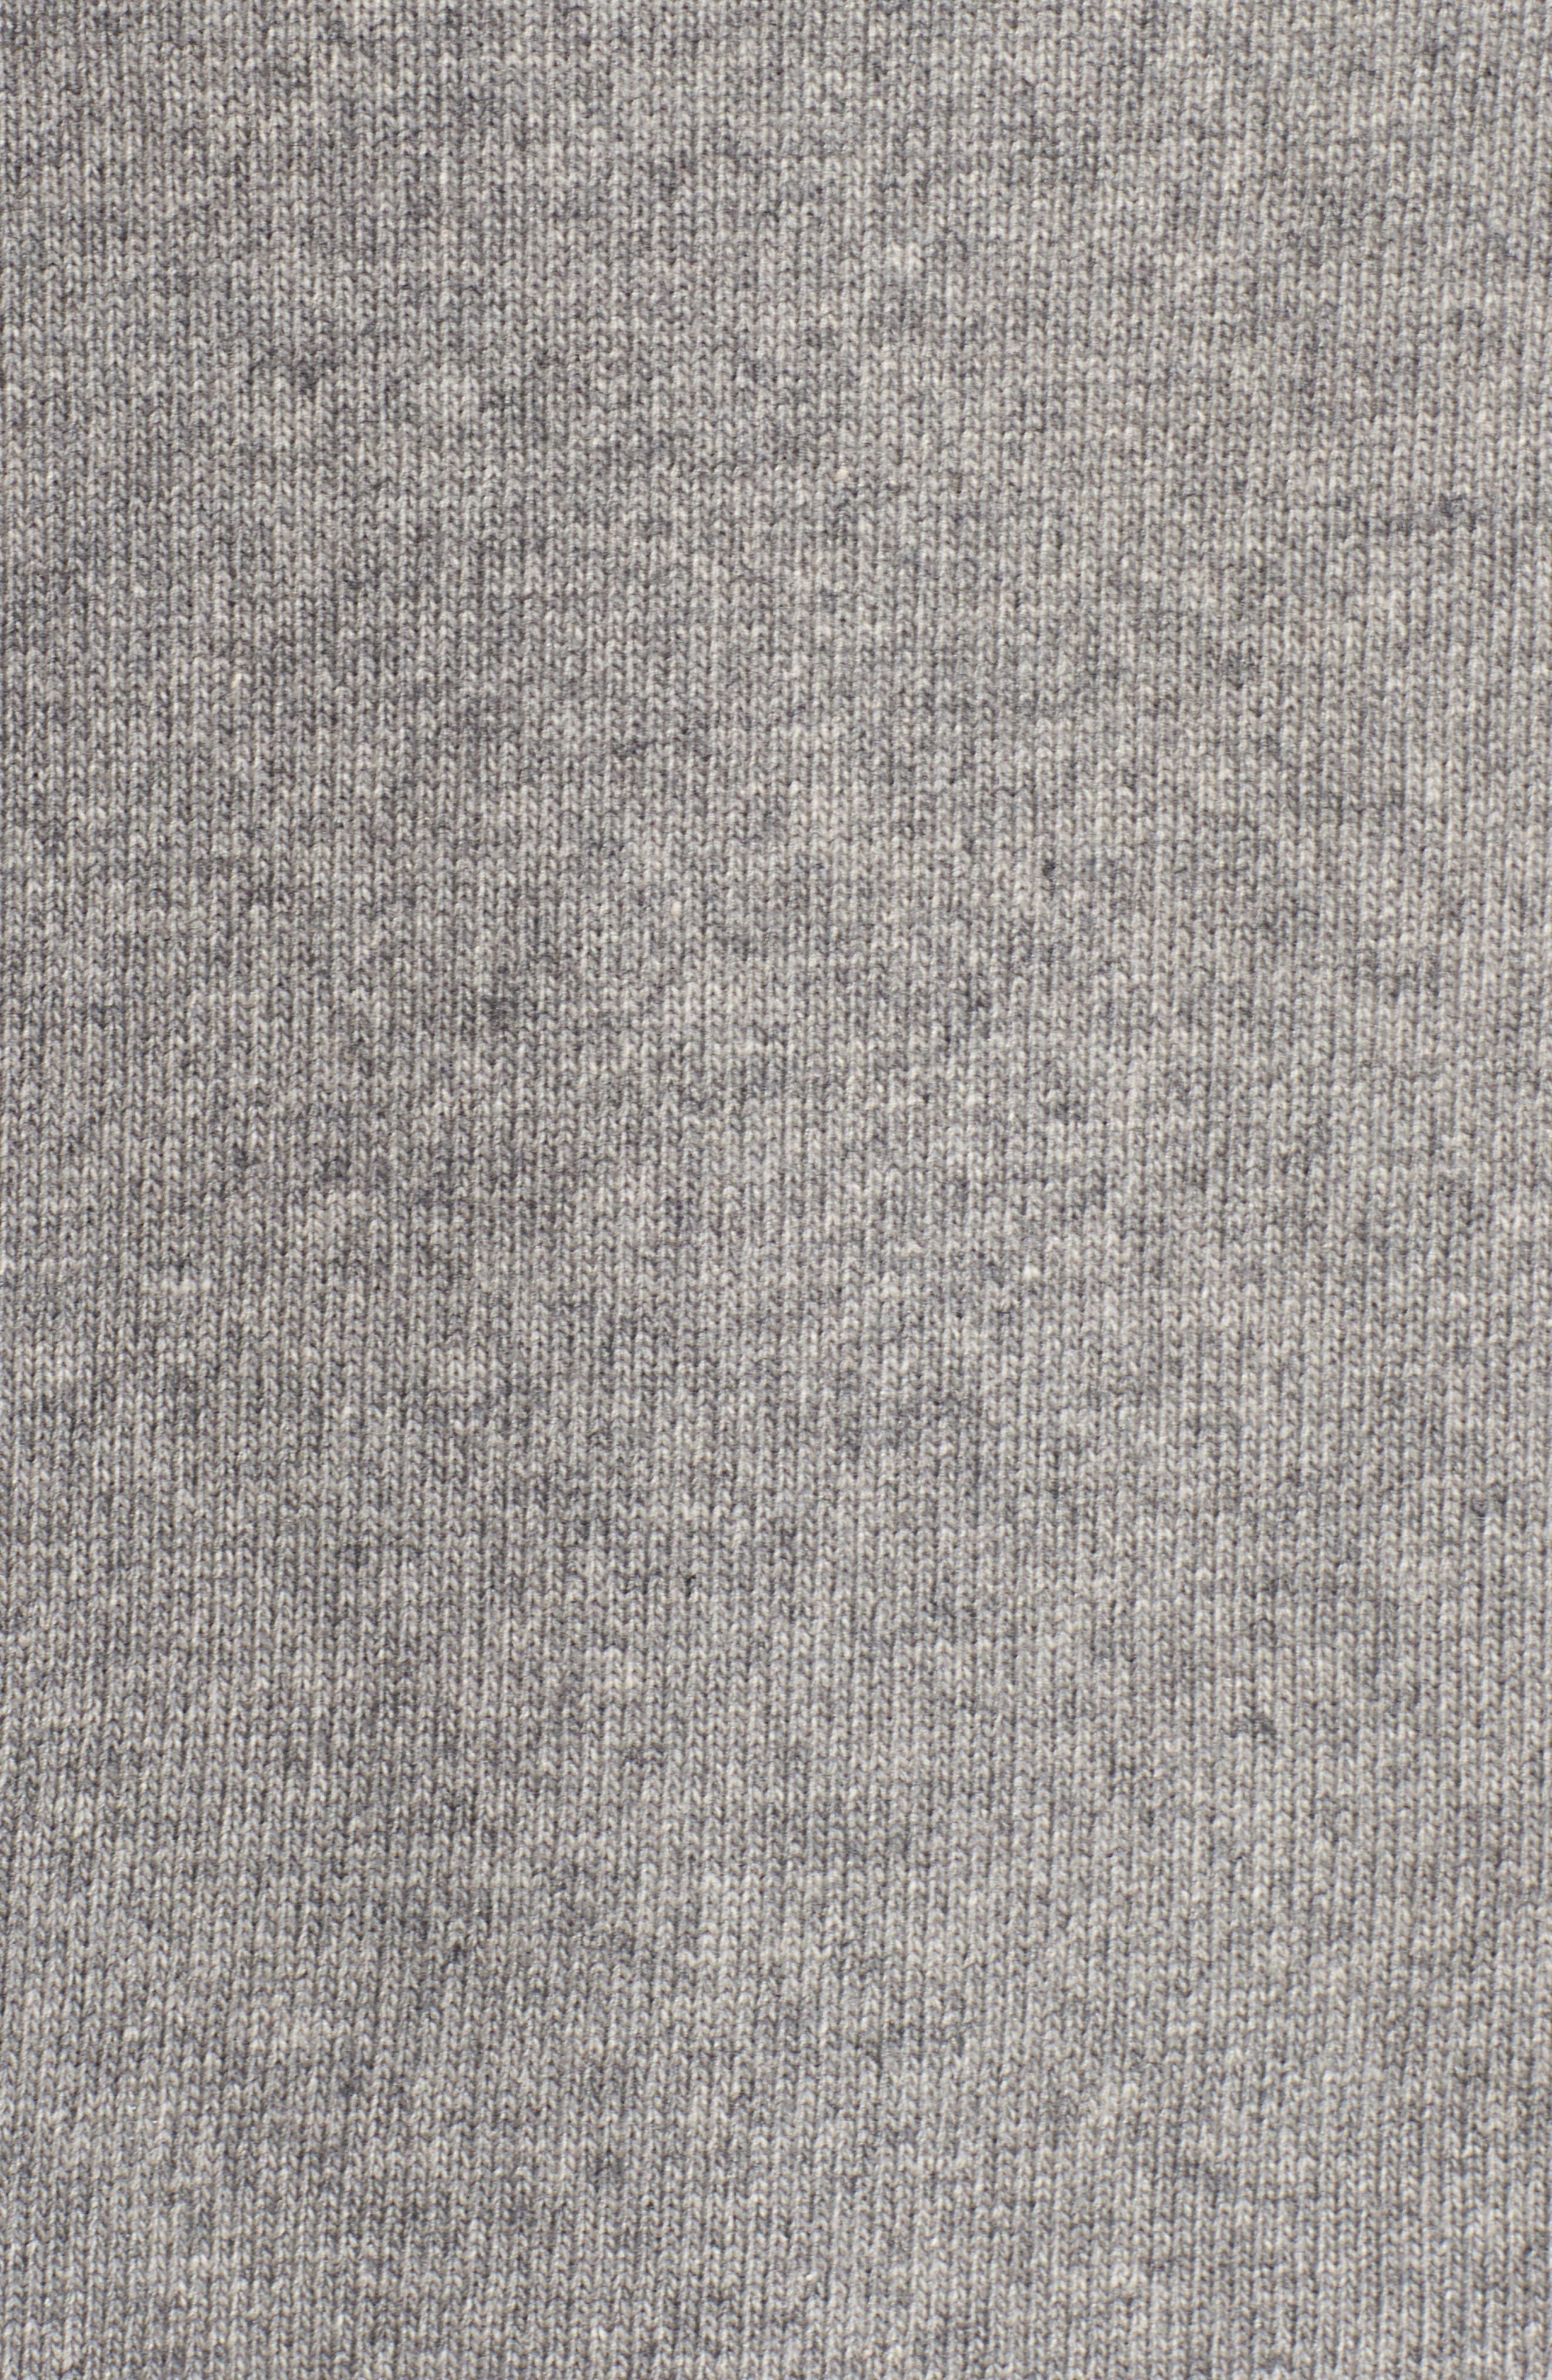 Rhodyn Off The Shoulder Sweater,                             Alternate thumbnail 5, color,                             GREY HEATHER